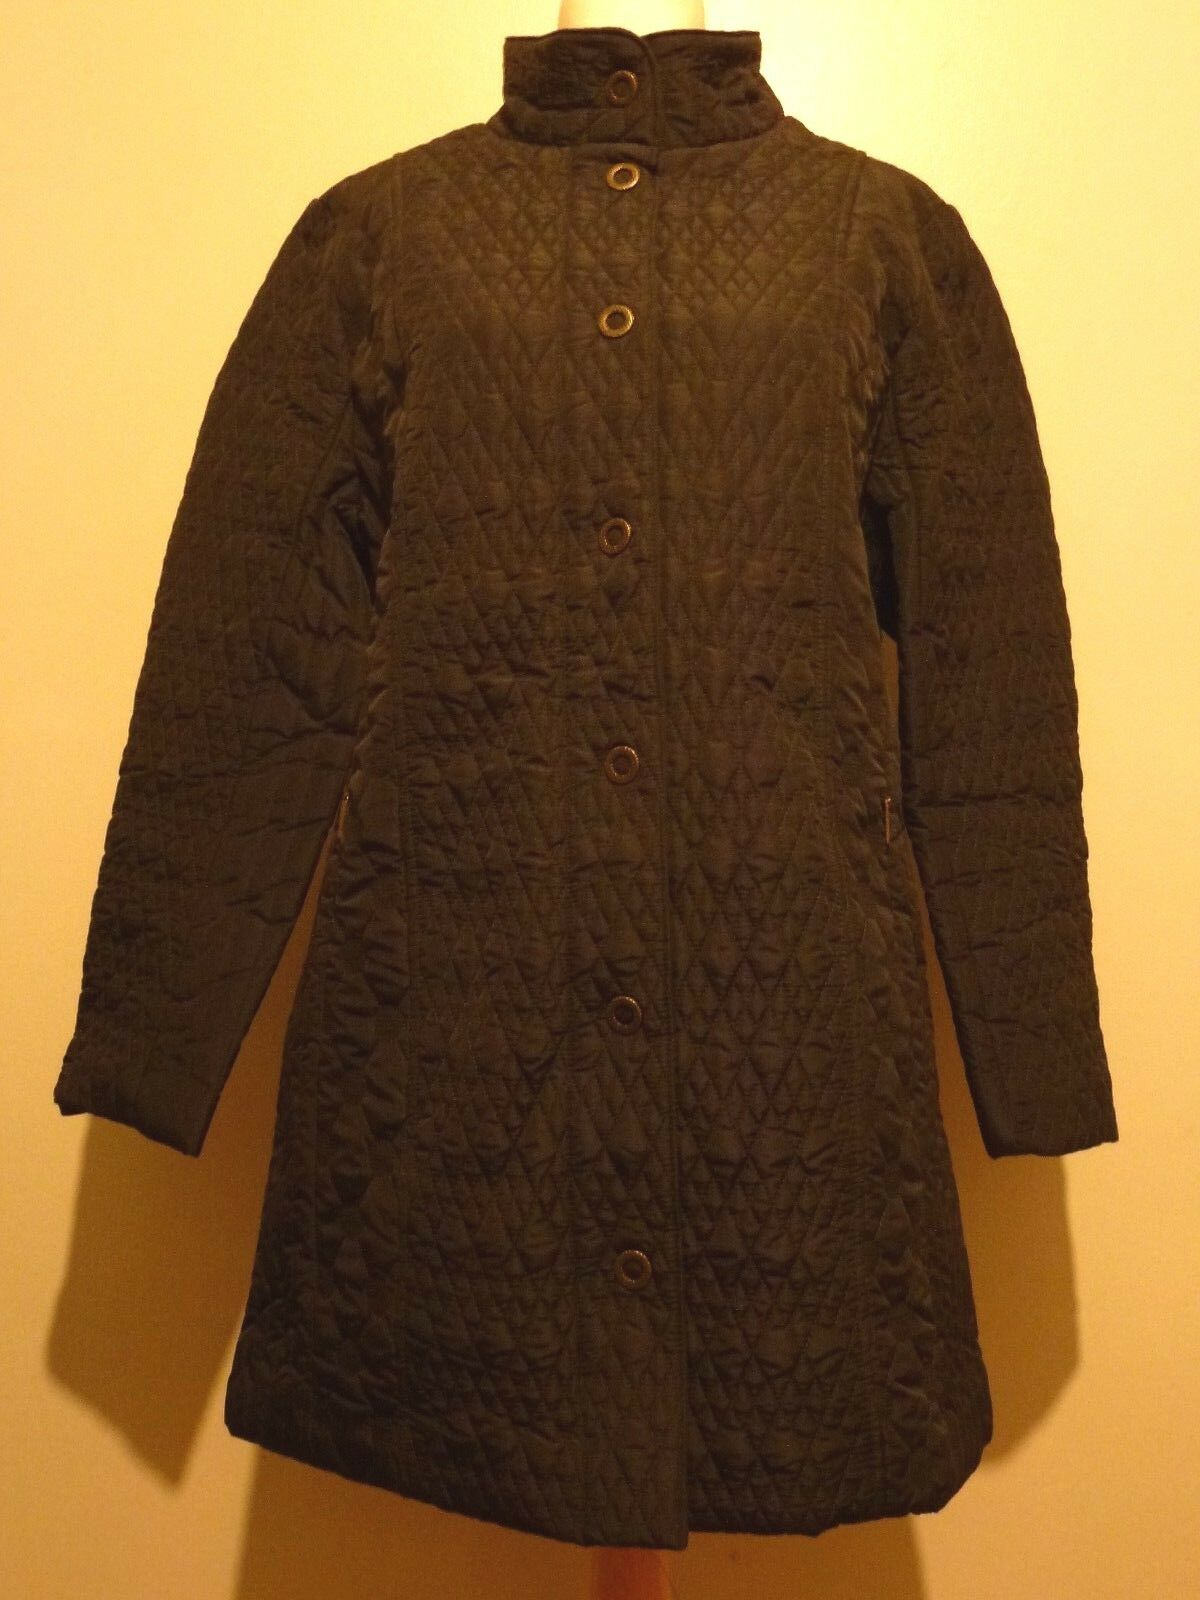 Tigi Woodland Contraste Acolchado con con con Textura Abrigo sizes 10-20 Nuevo Etiqueta a63f9c